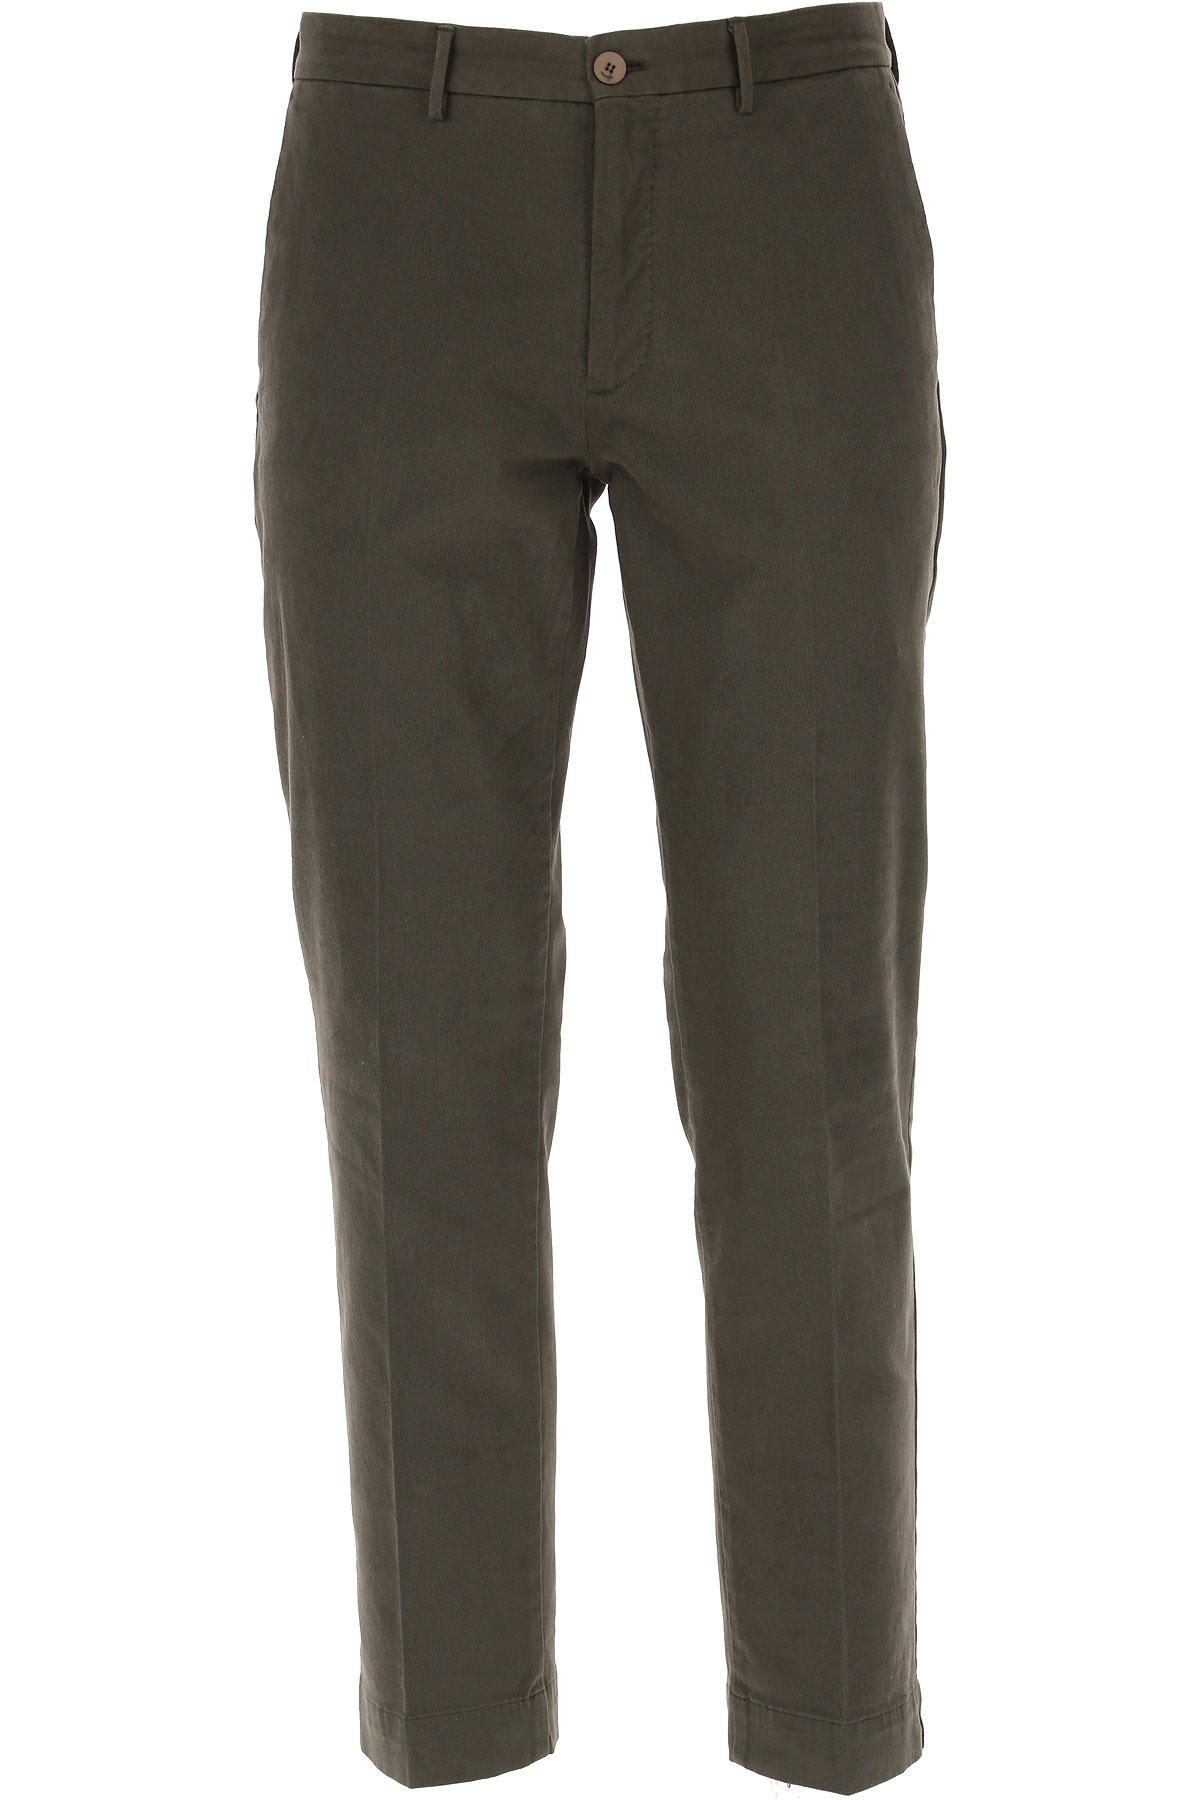 Incotex Pants for Men On Sale, Dark Asphalt Grey, Cotton, 2019, 32 34 36 38 40